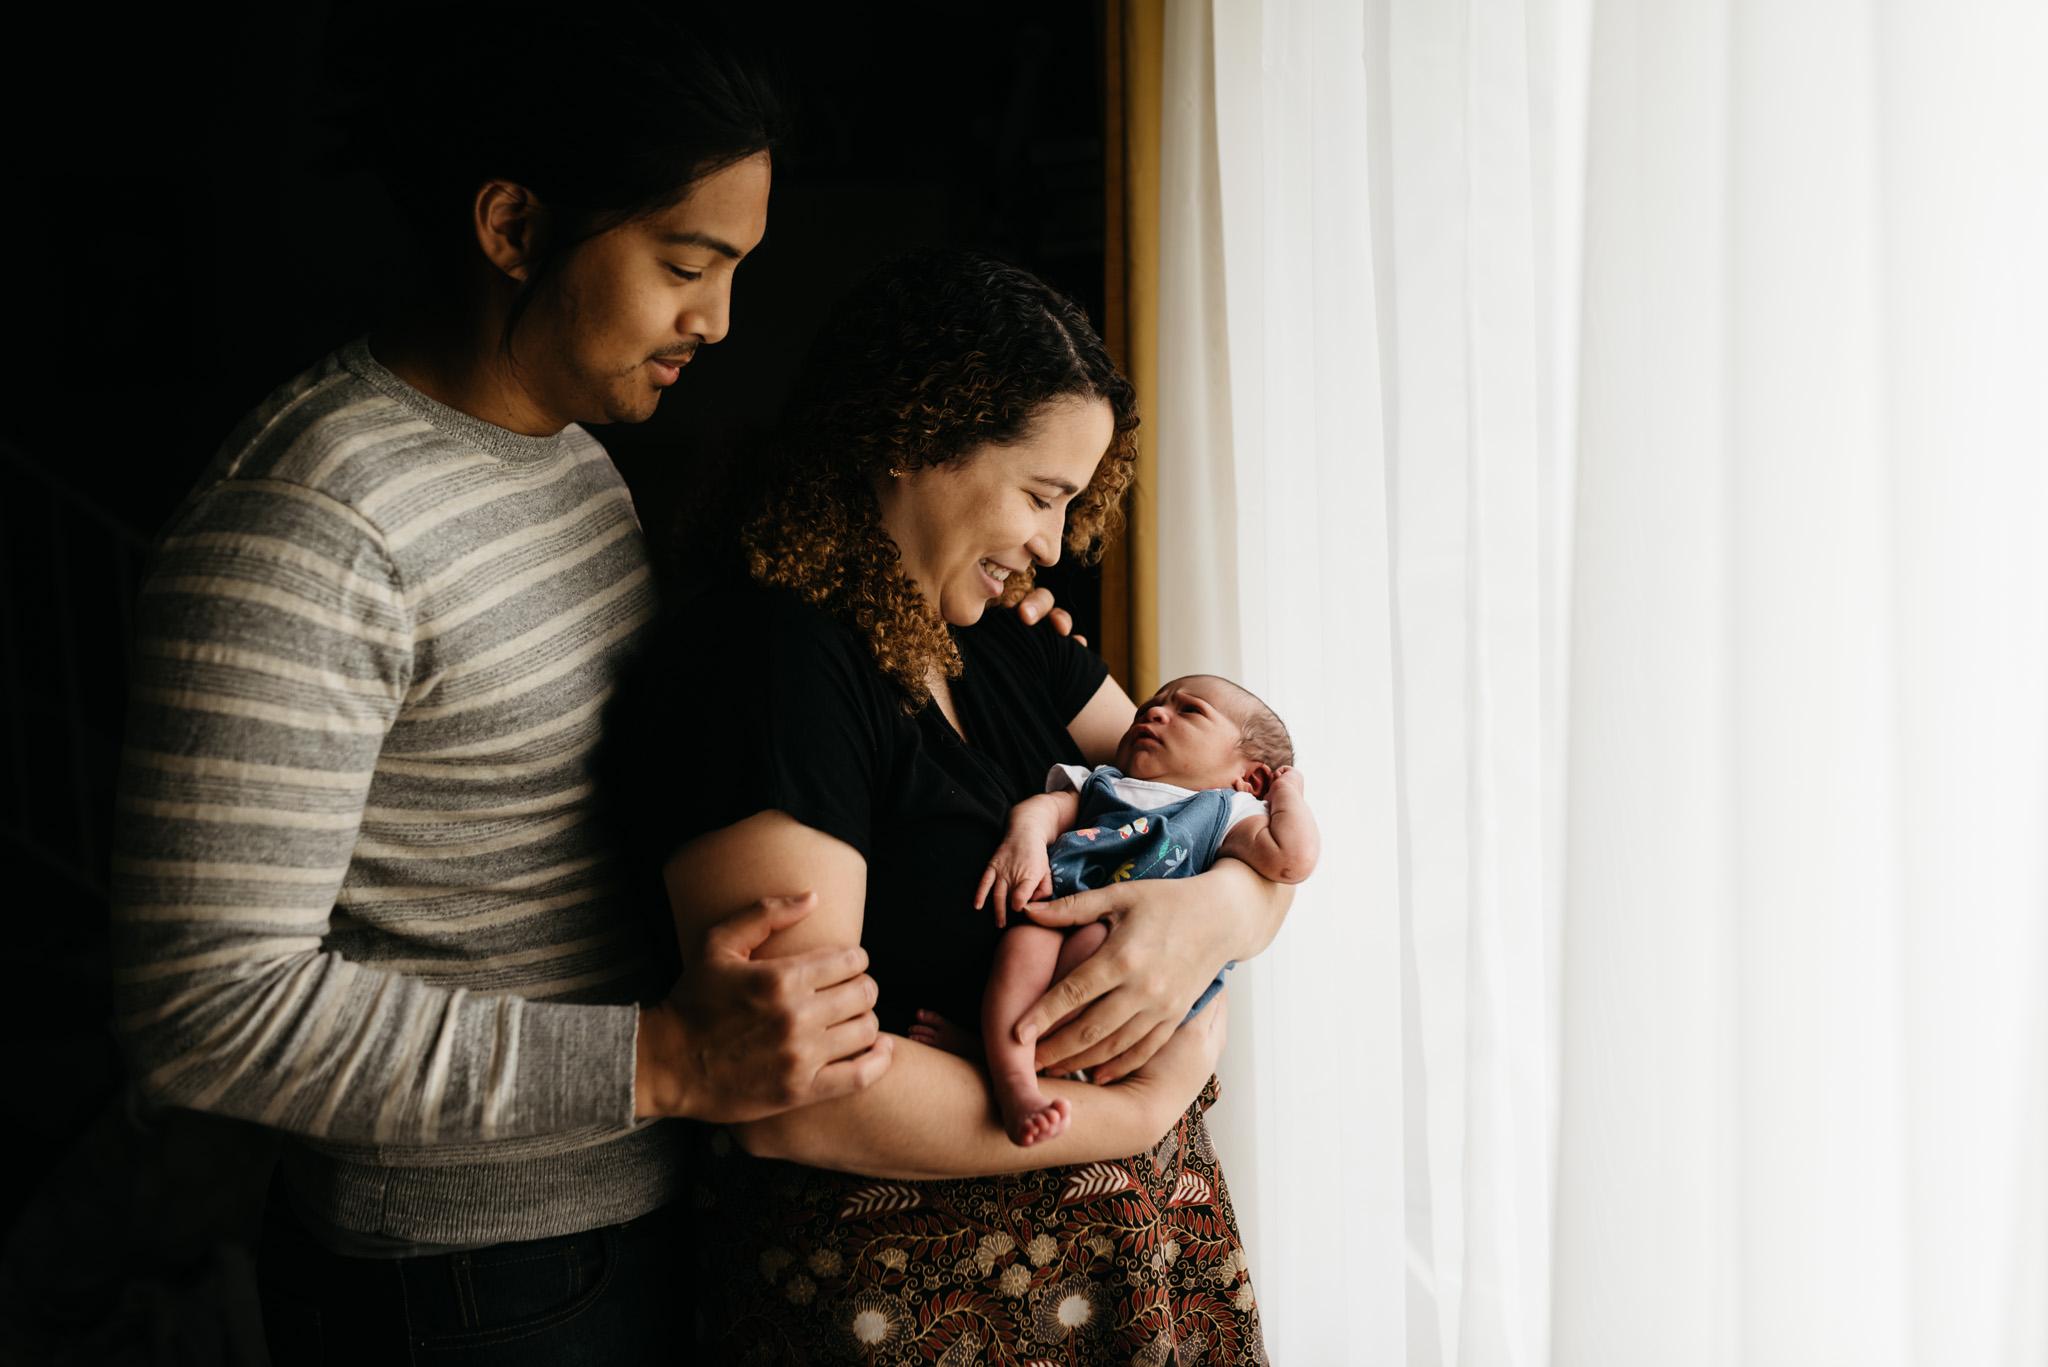 newborn-photography-columbus-ohio-erika-venci-photographynewborn-photography-columbus-ohio-erika-venci-photography